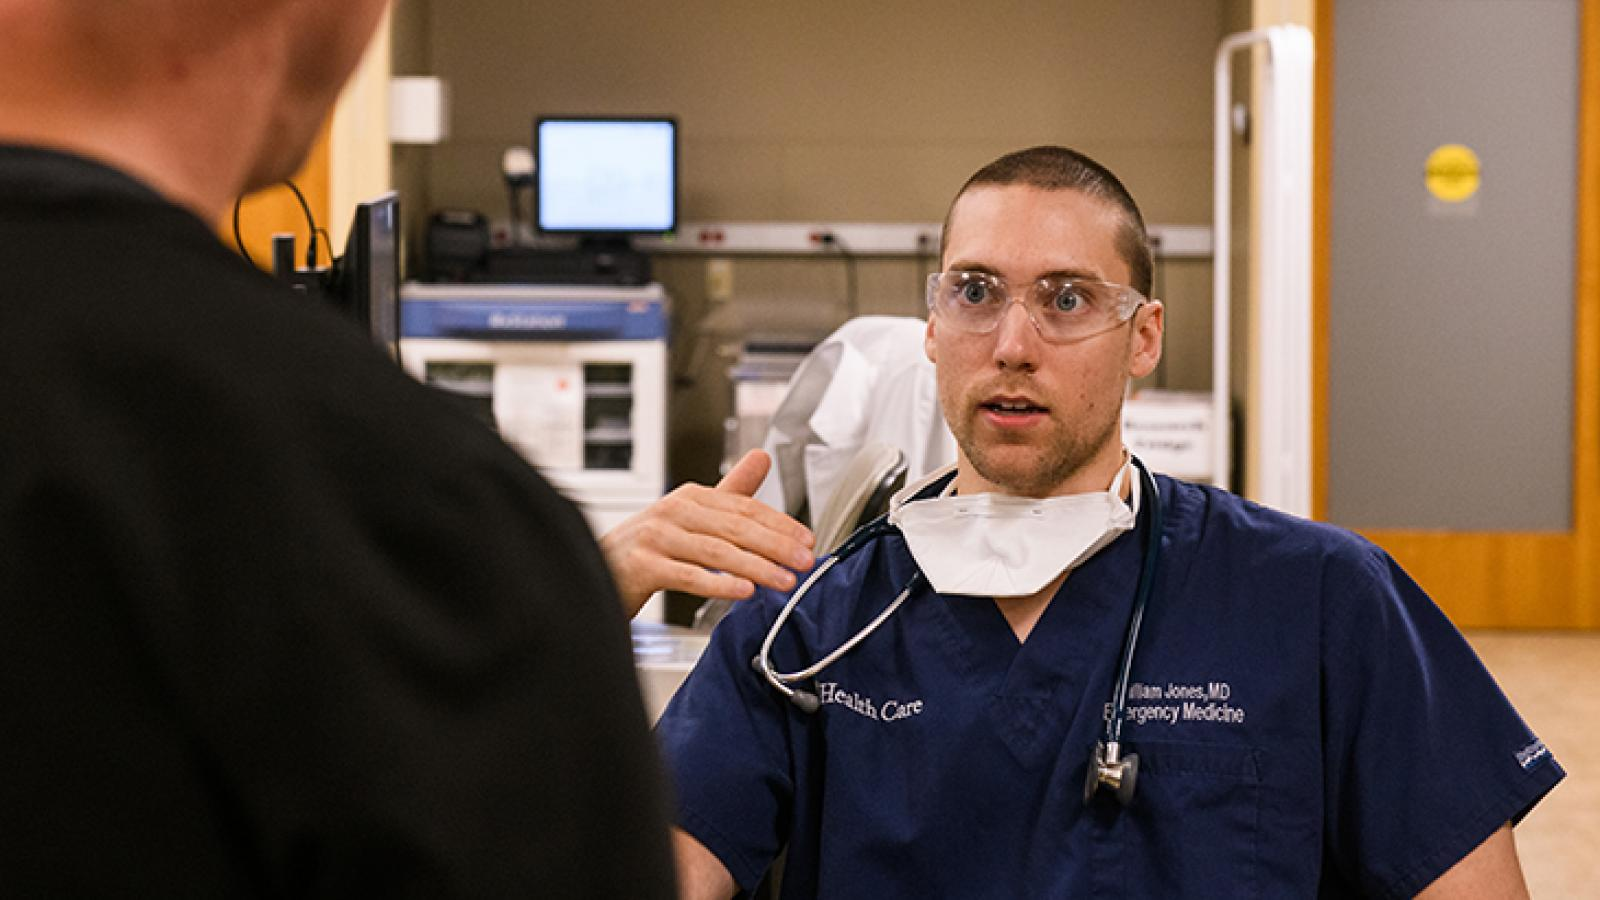 EM Dr. Jones with colleague